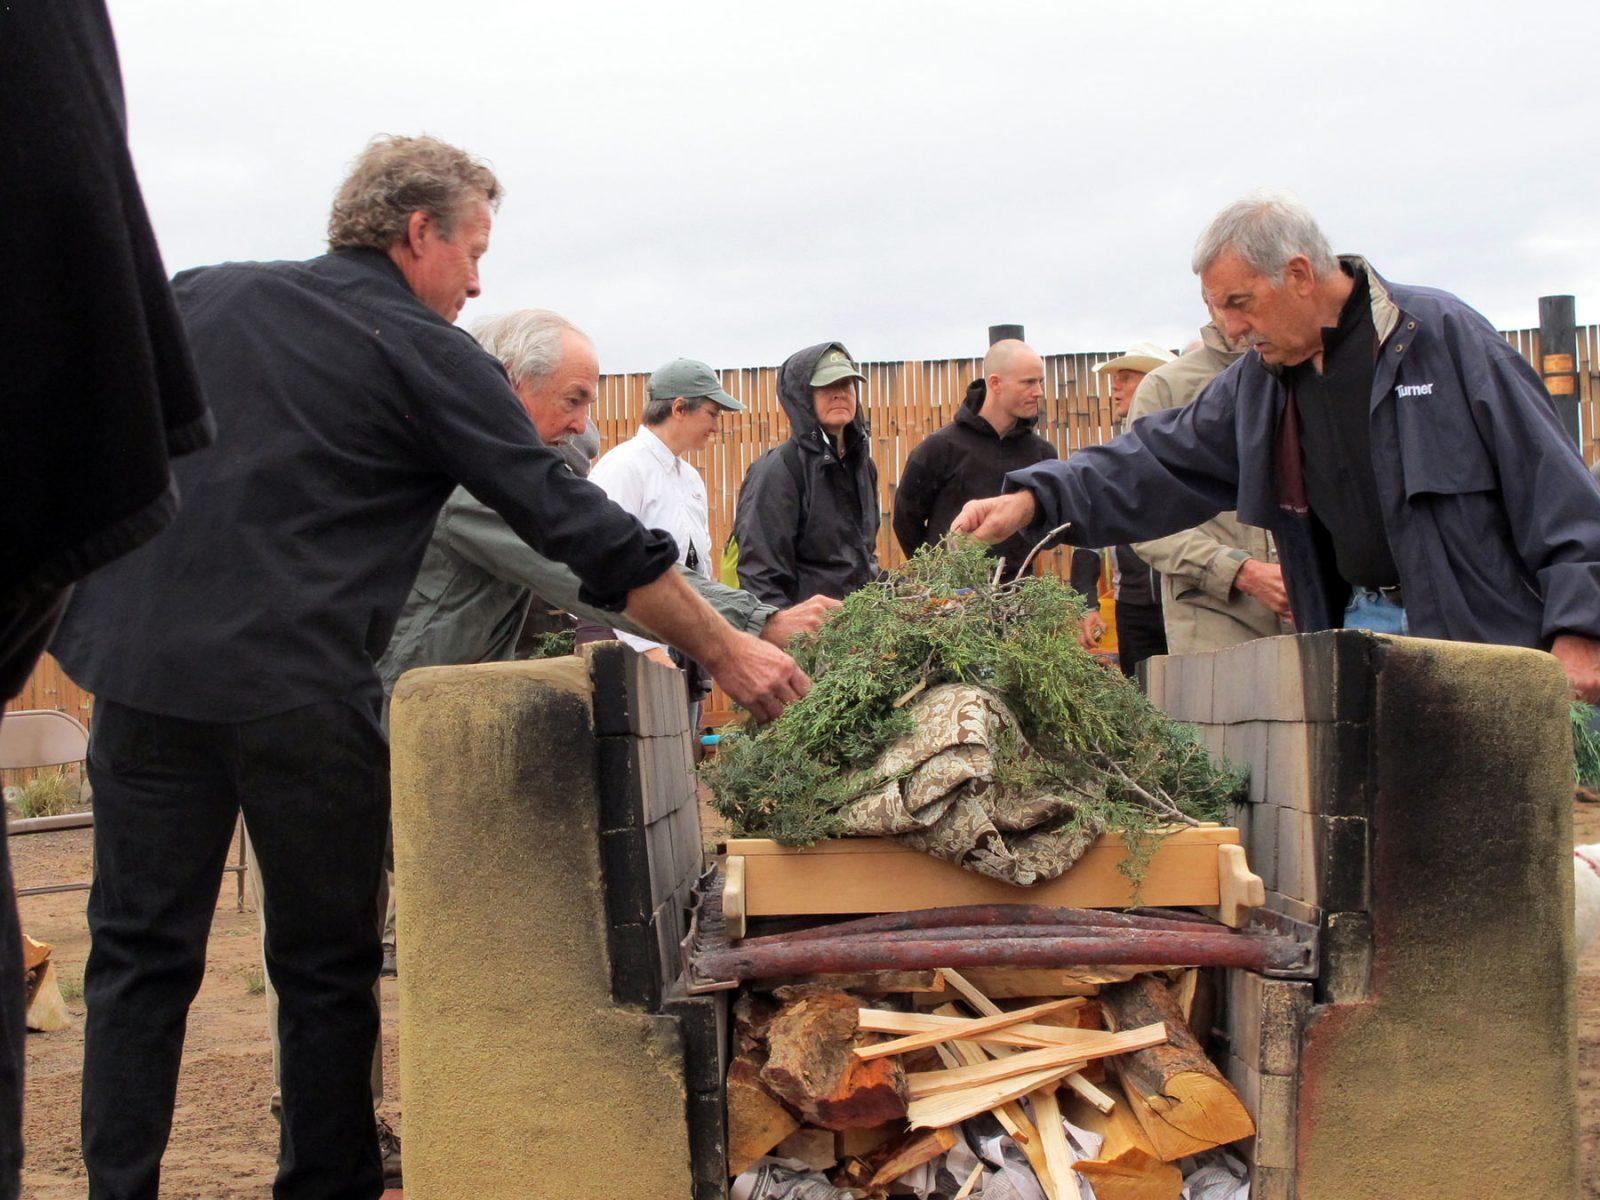 Colorado open-air cremation